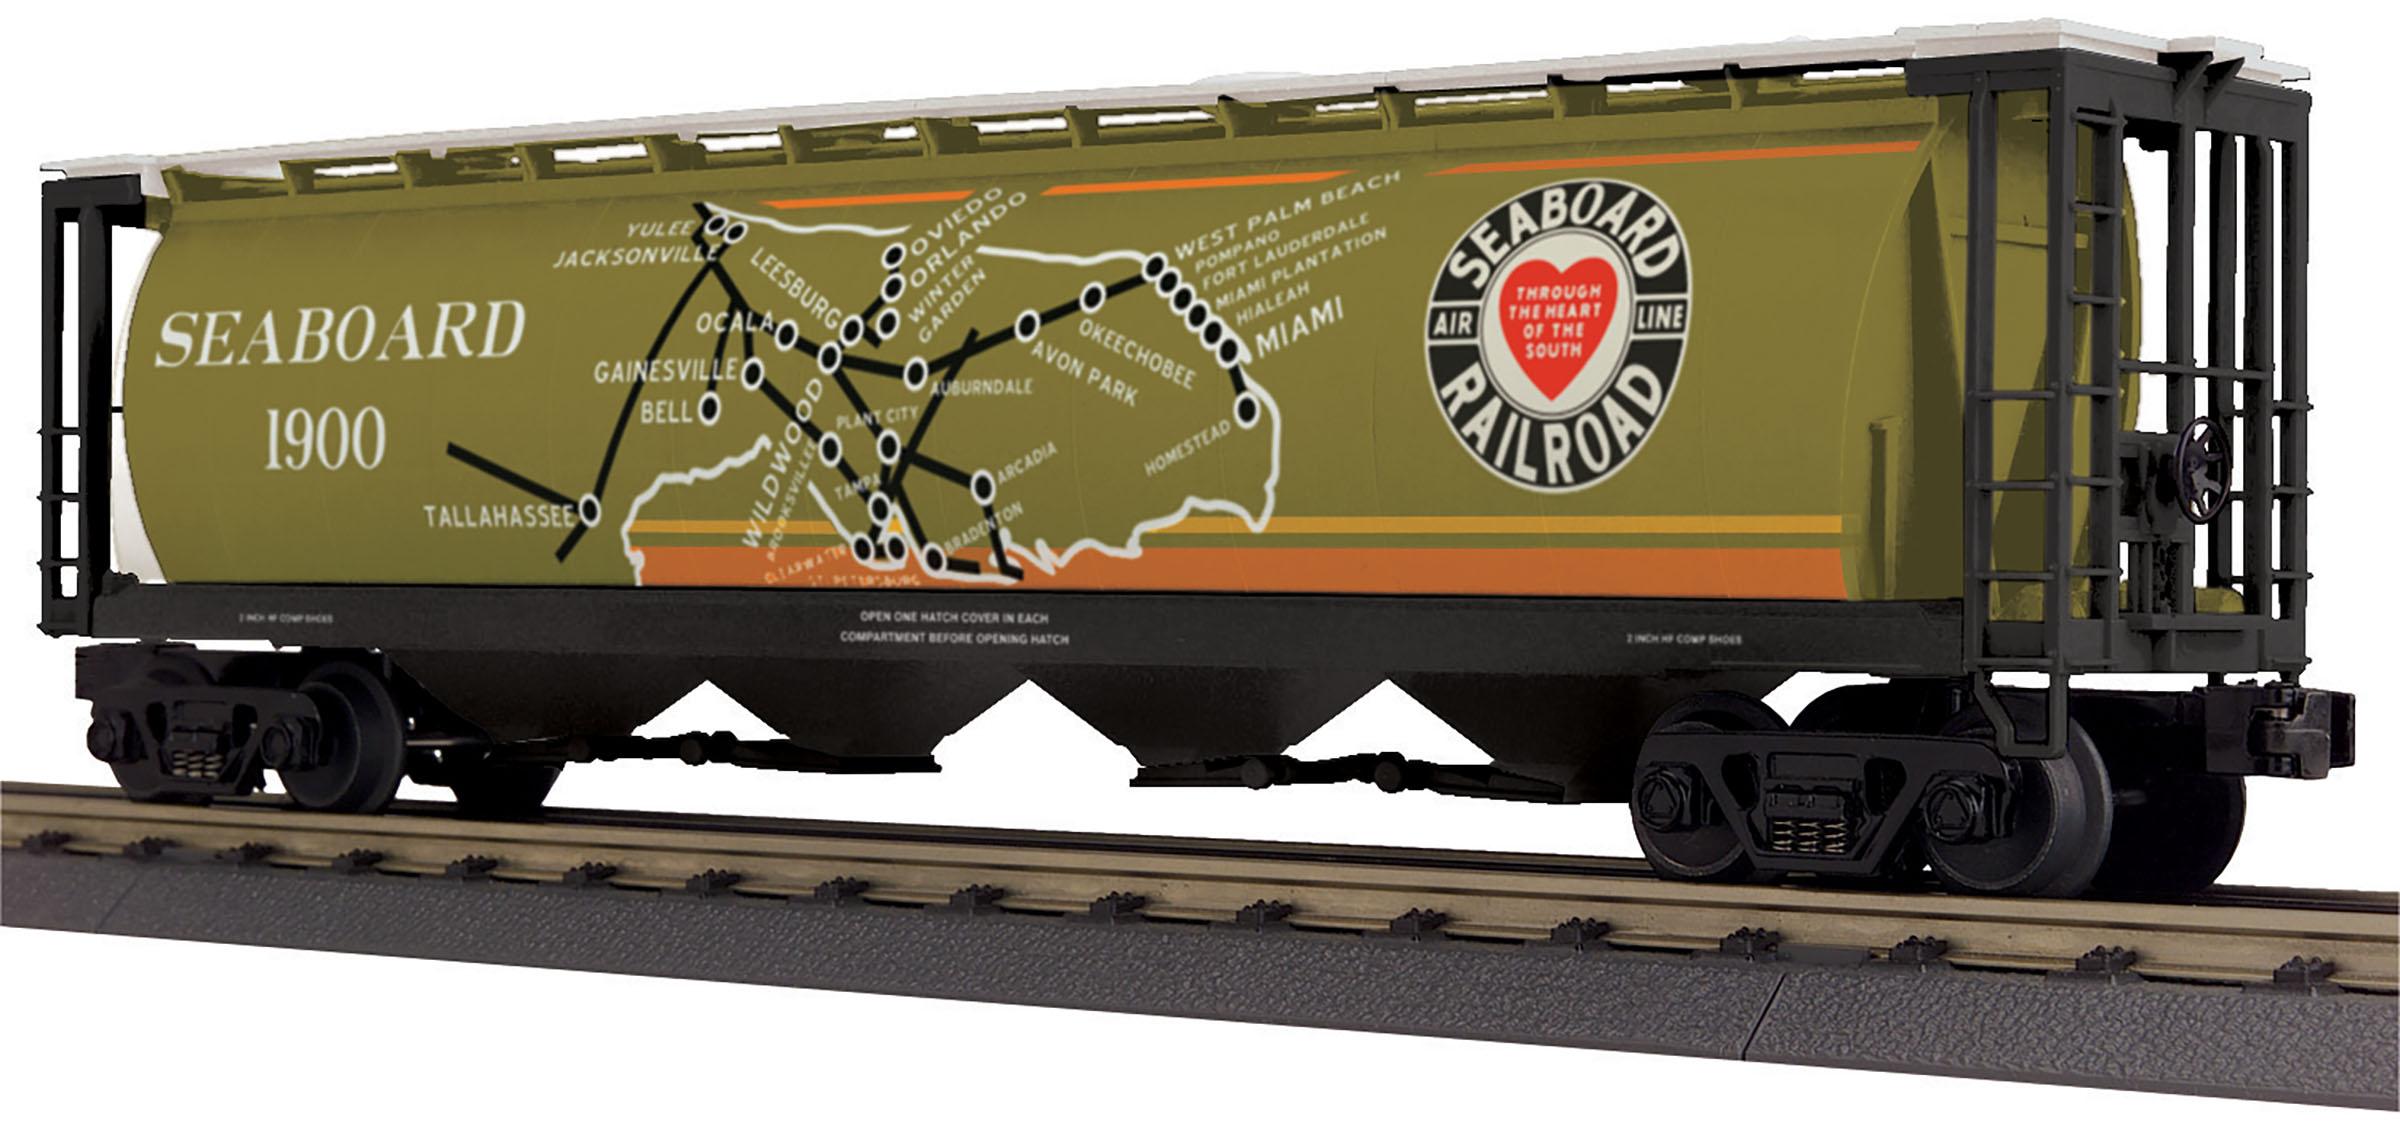 MTH 30-75647 4 Bay Cylindrical Hopper Car 3 Rail RailKing Seaboard Air Line 1900